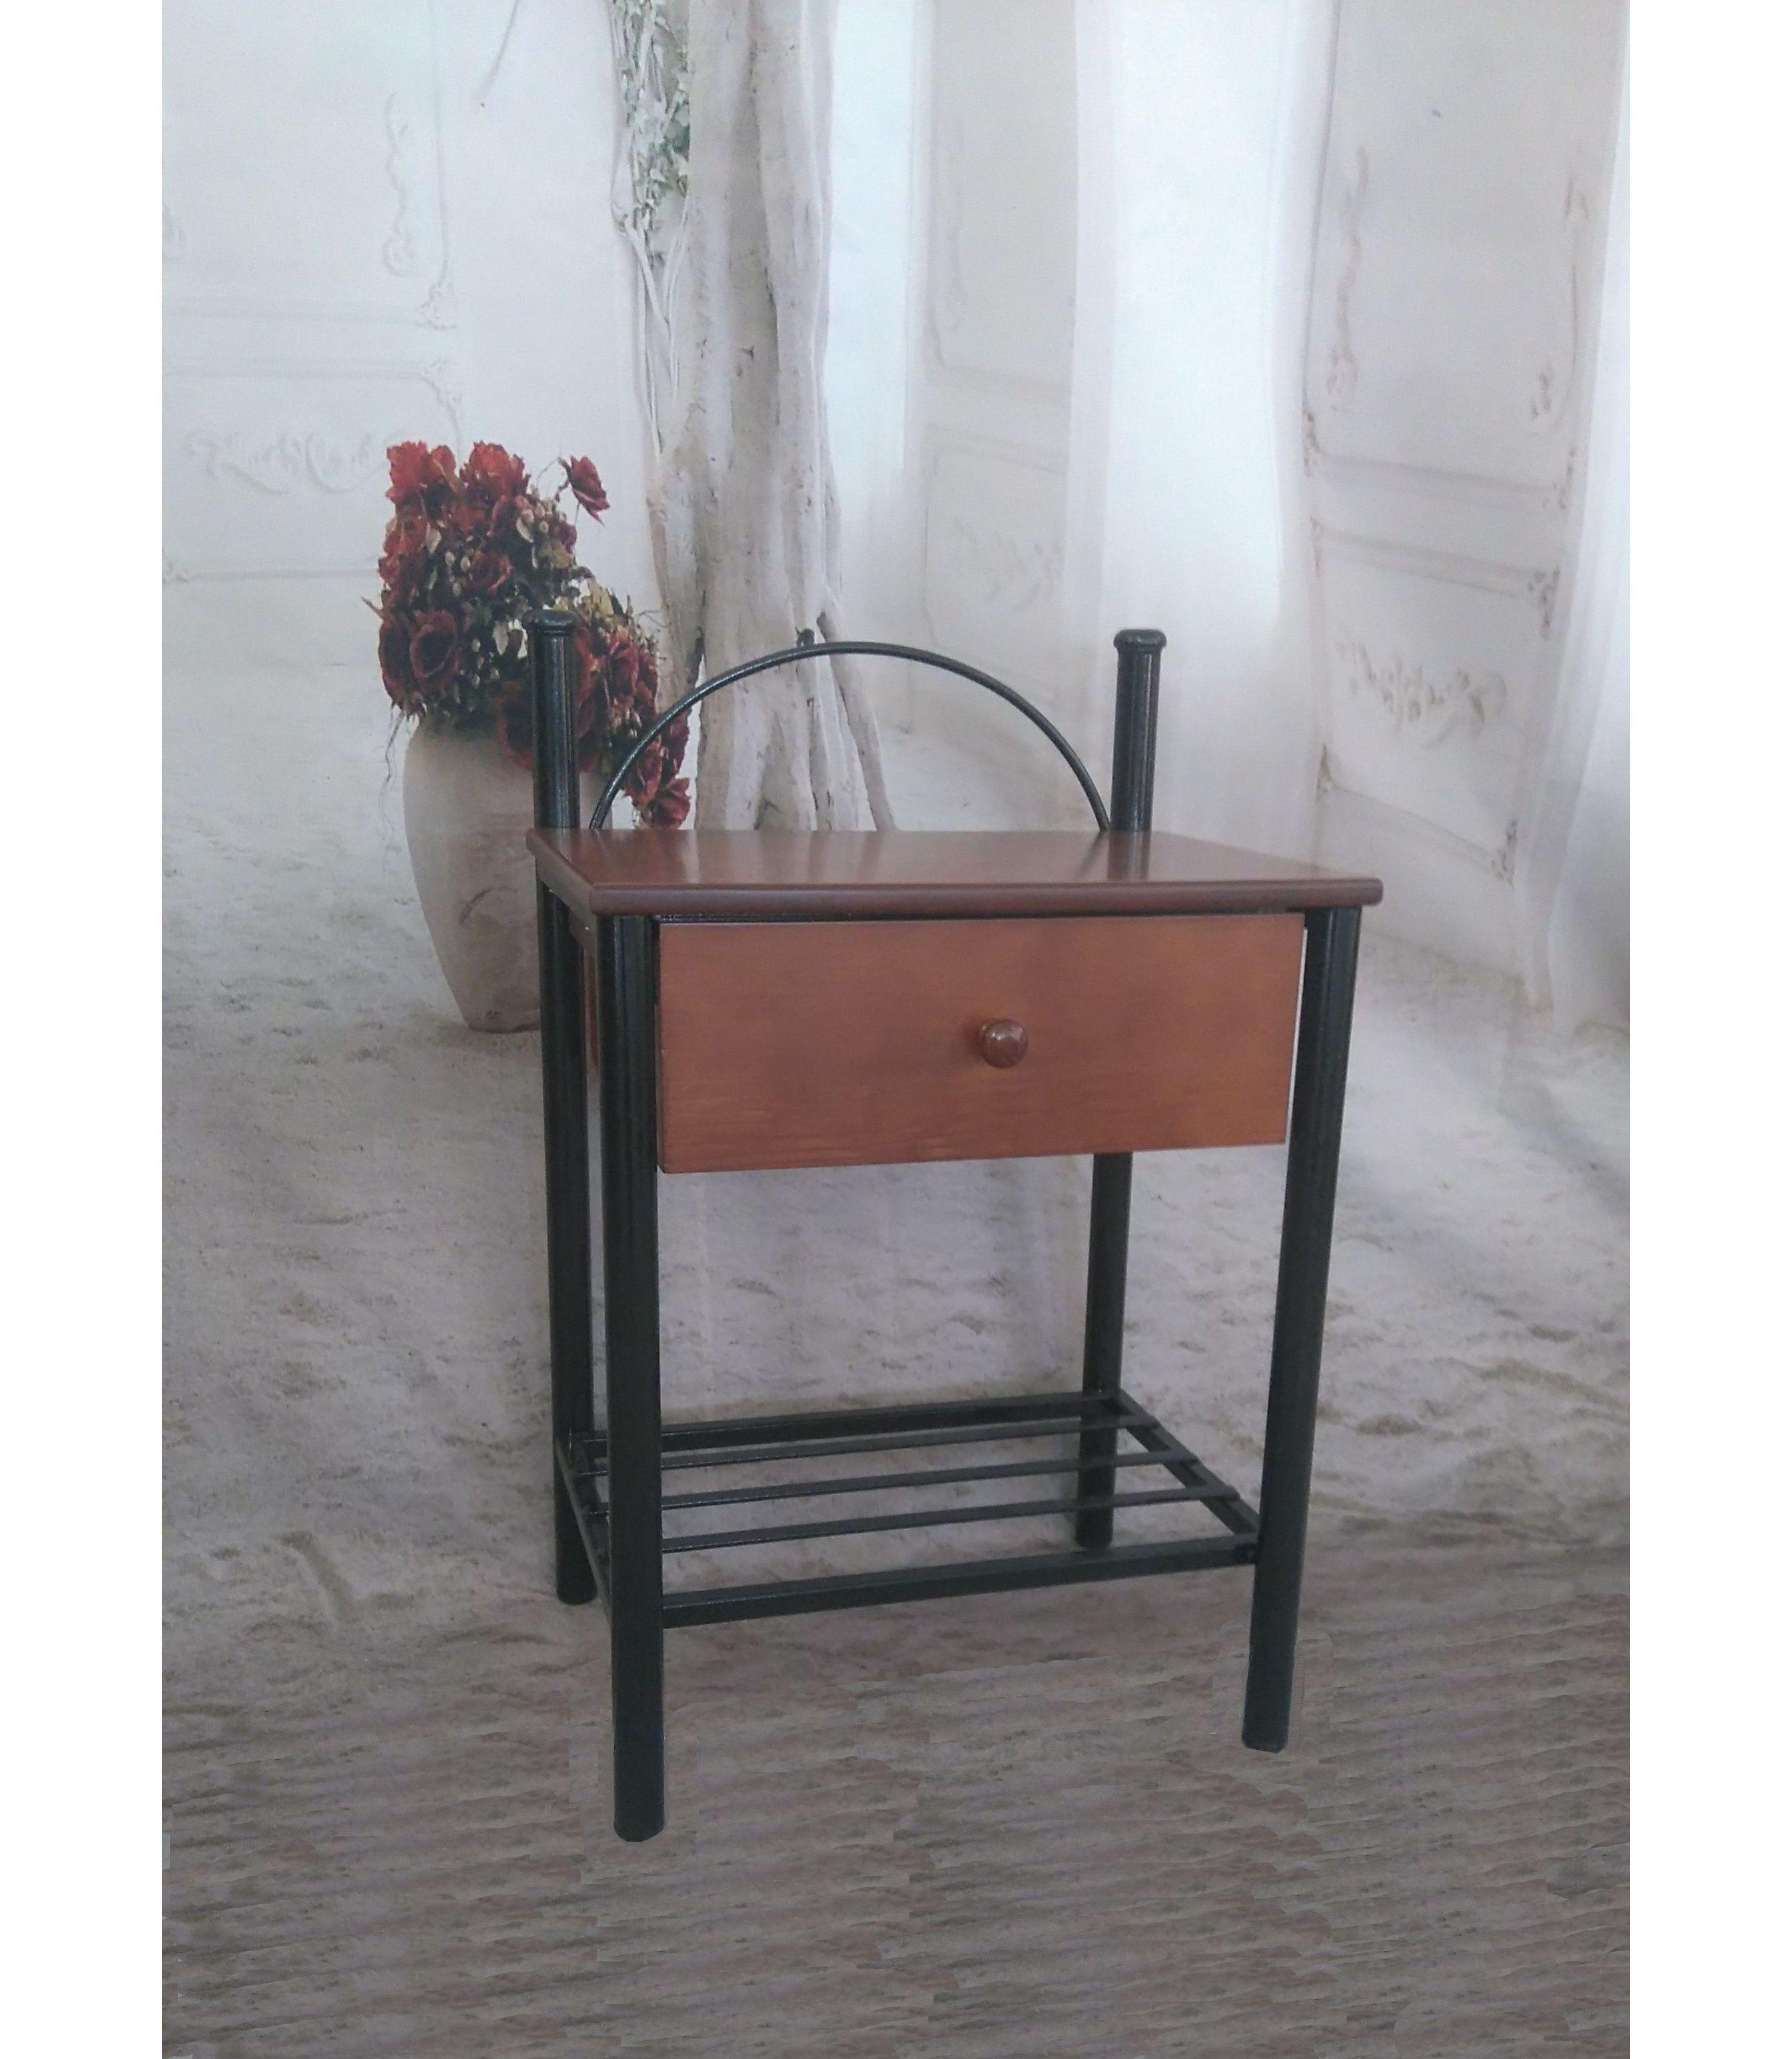 Mesita Cuenca: Catálogo de muebles de forja de Forja Manuel Jiménez